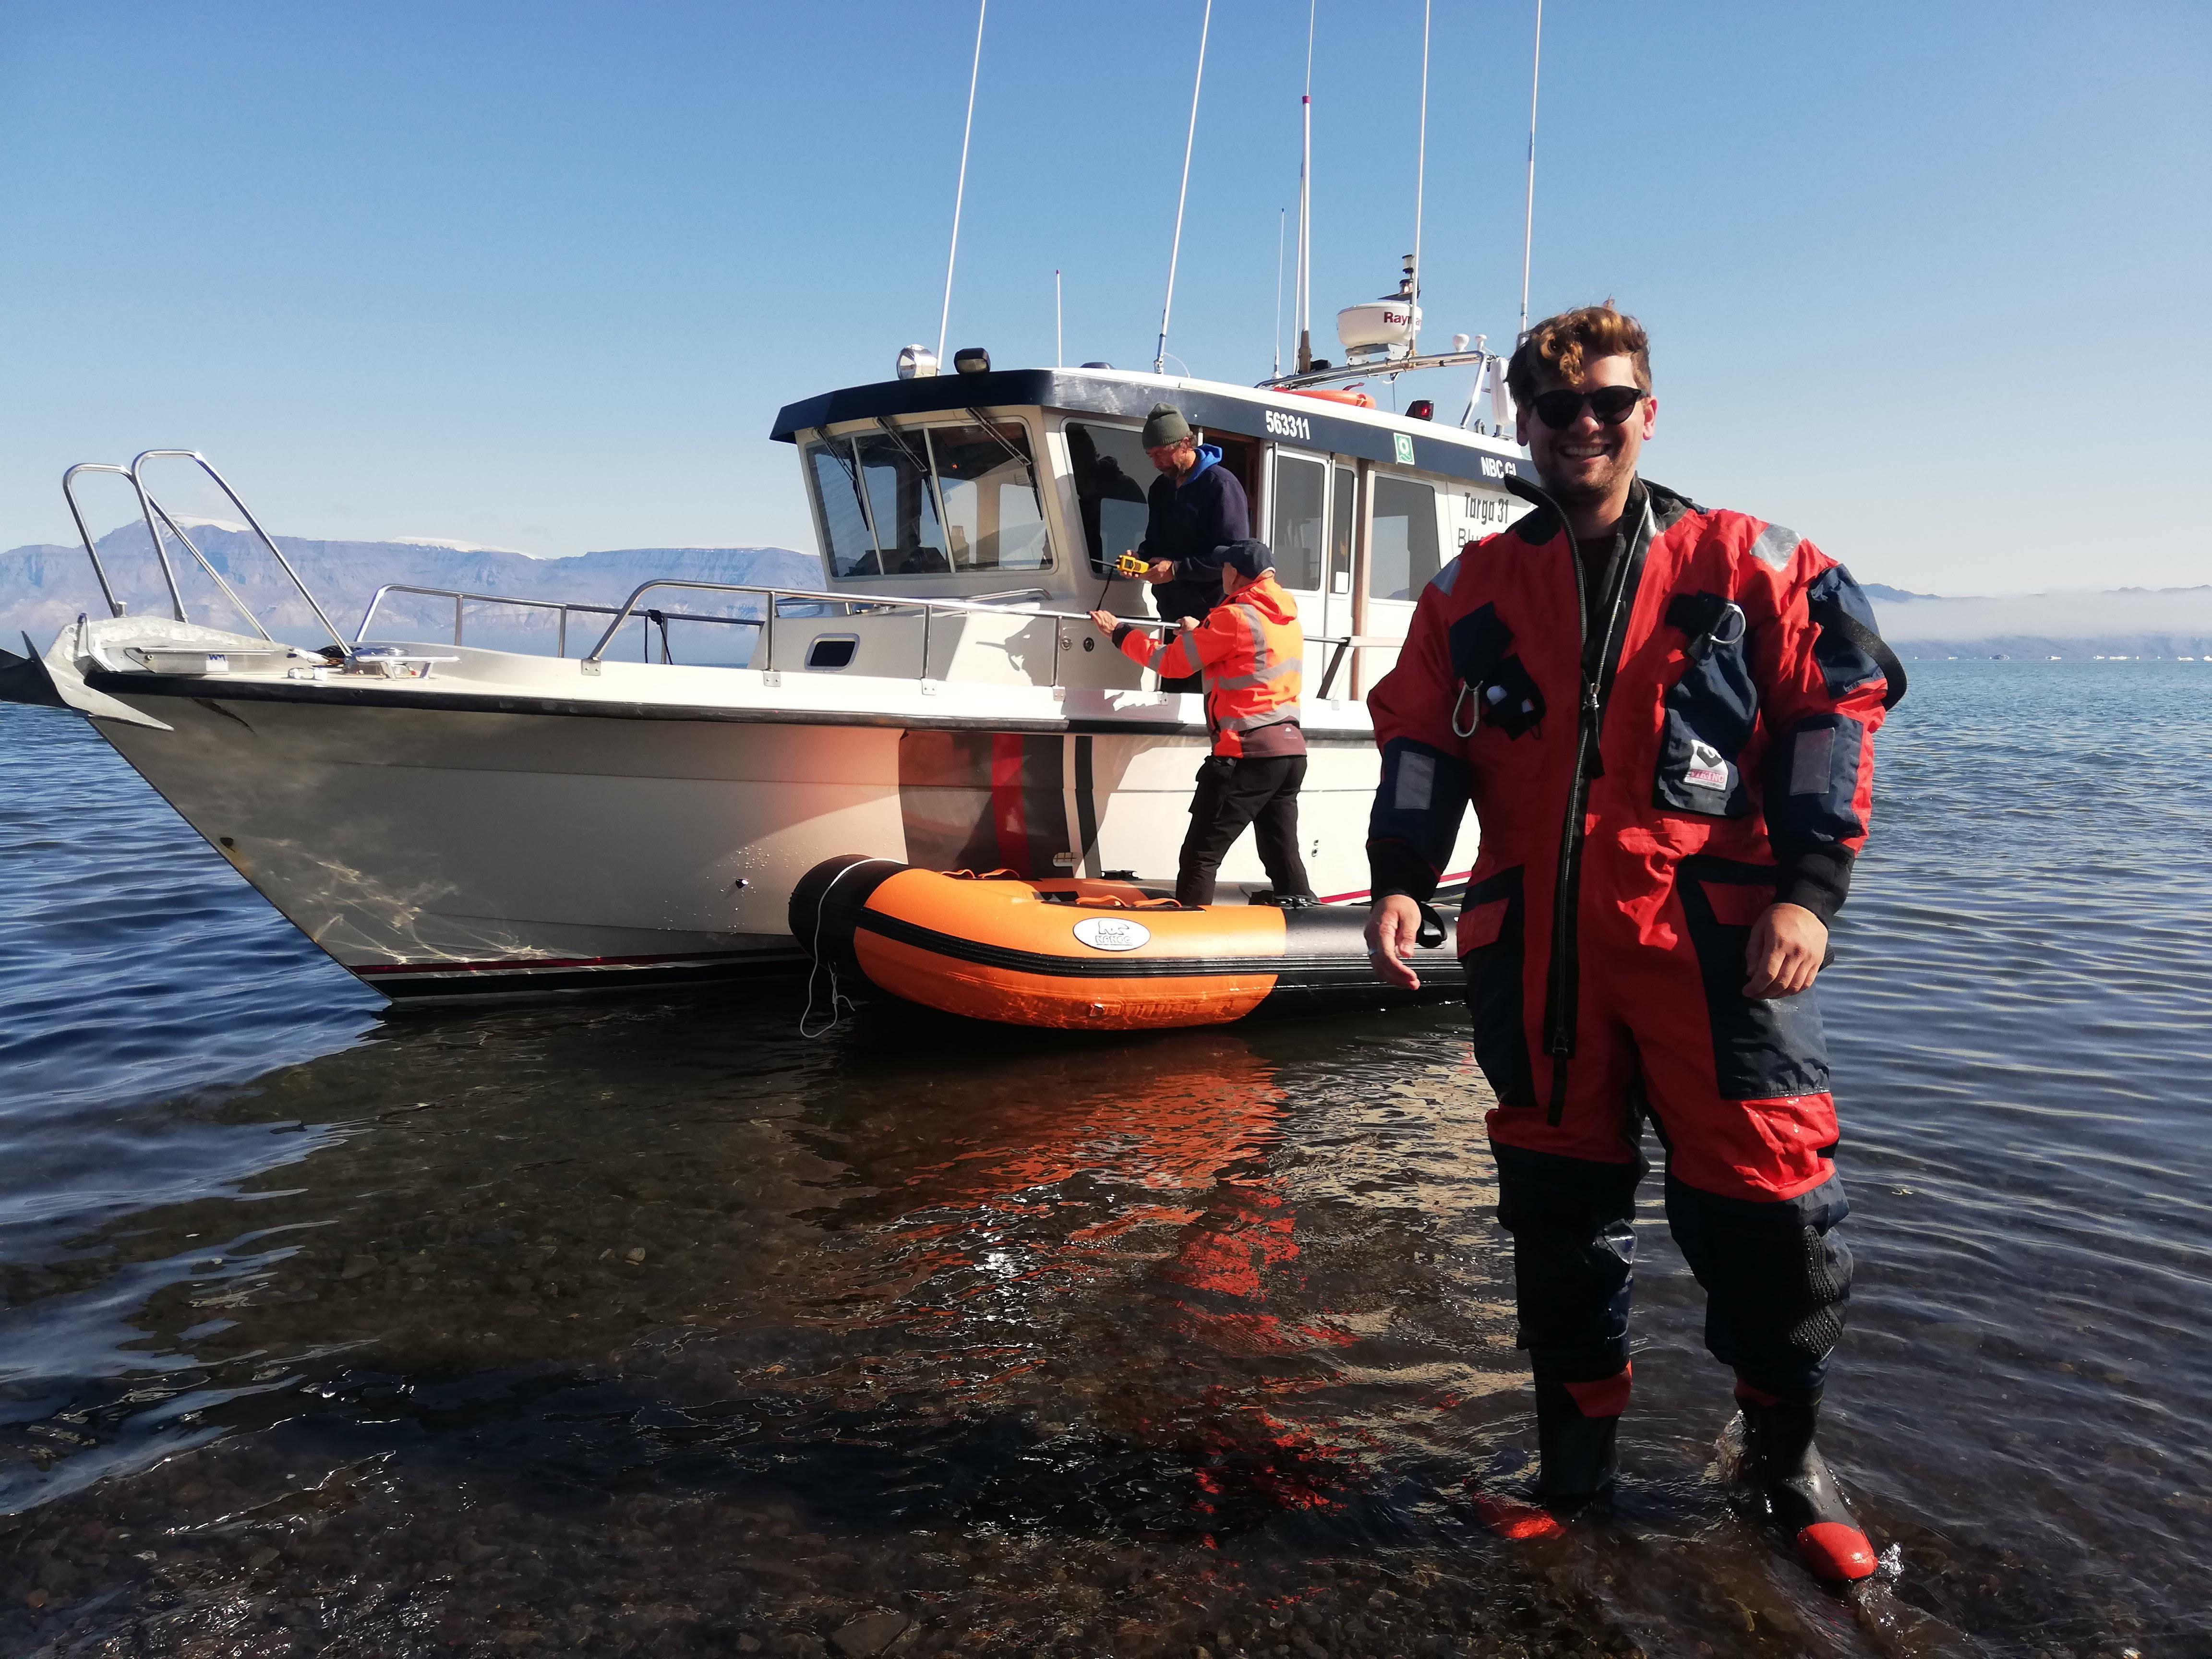 Internship highlight: Ethan Barnes with Bluejay mining (Greenland)